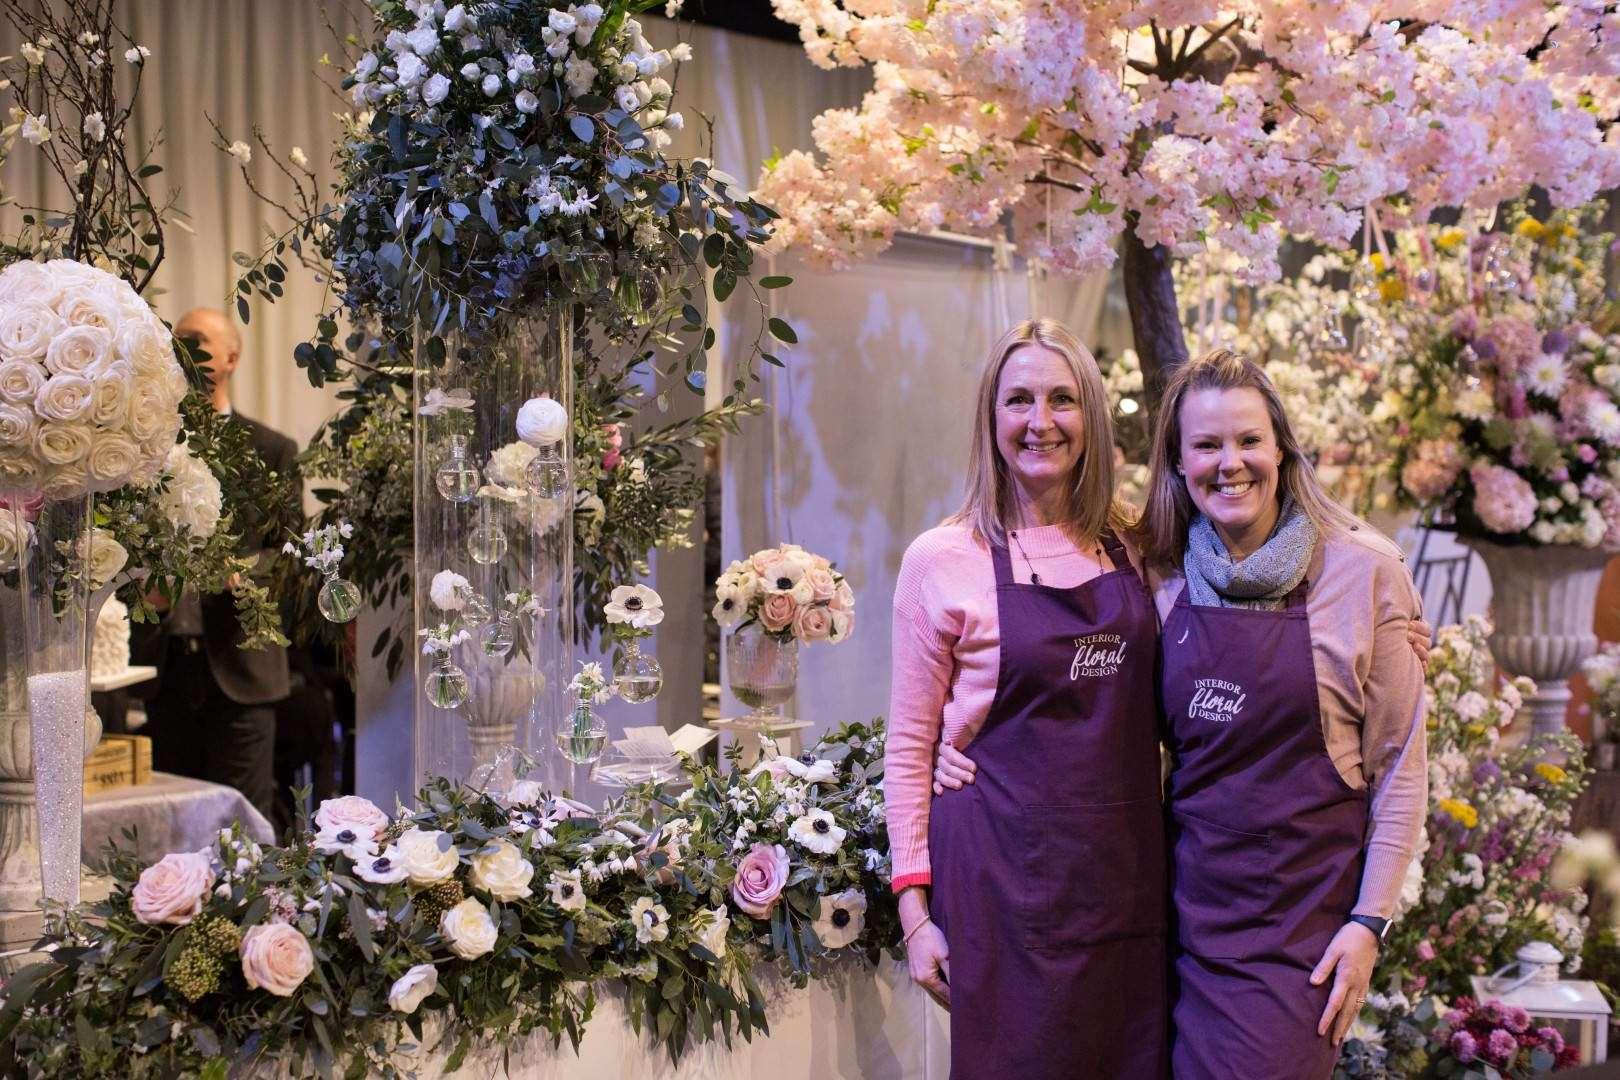 Milsom Wedding Show Suppliers Revealed